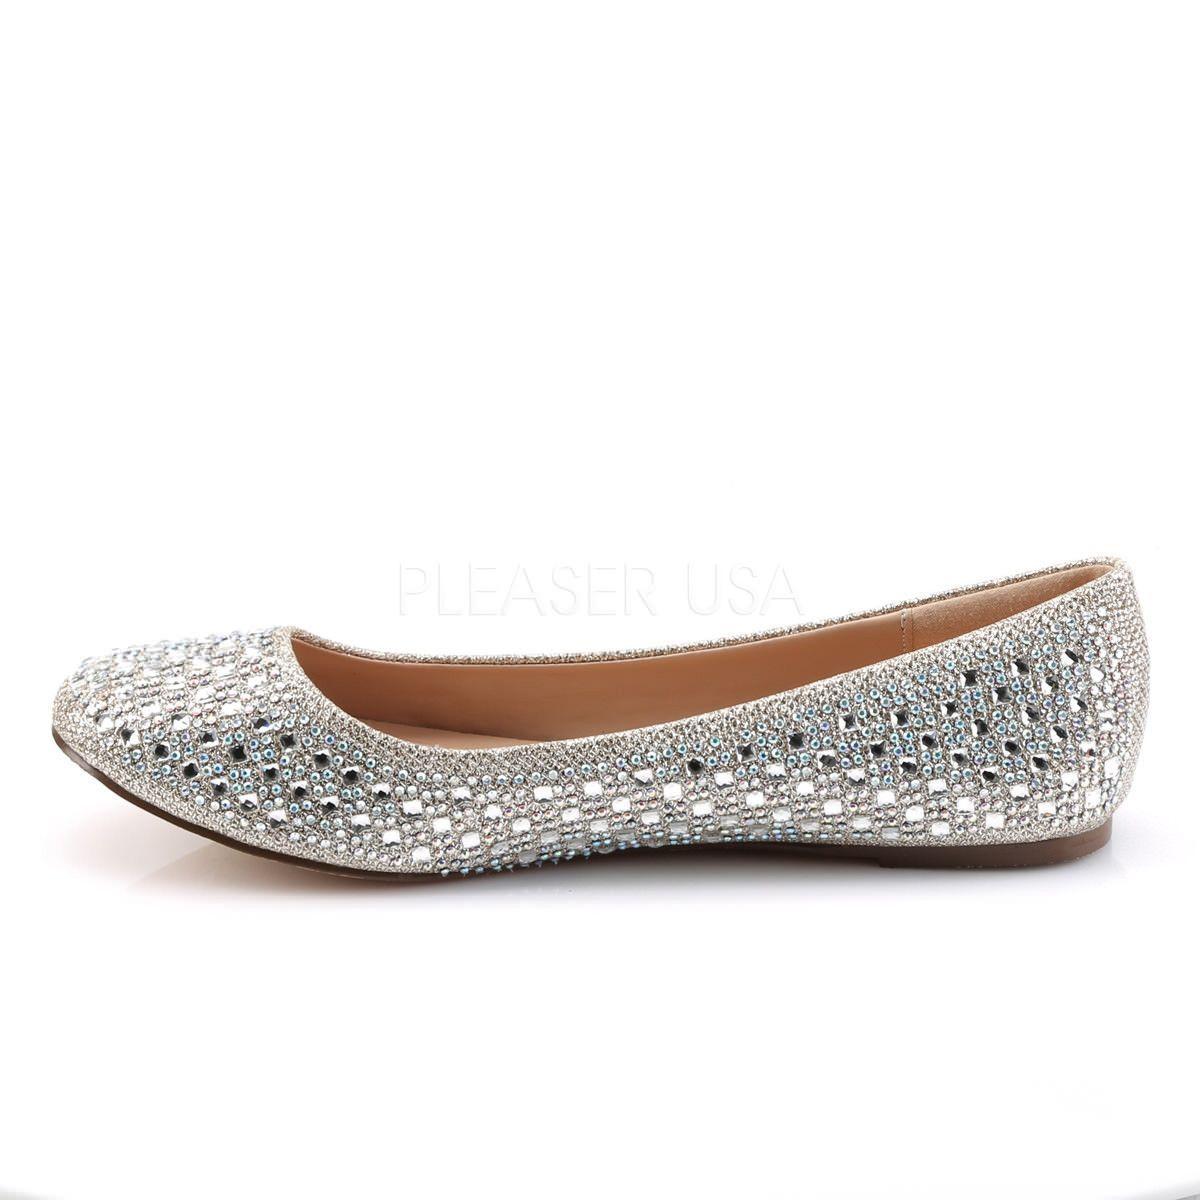 Brand New Women/'s Glitter Rhinestone Ballerina Ballet Flats Size 6-10